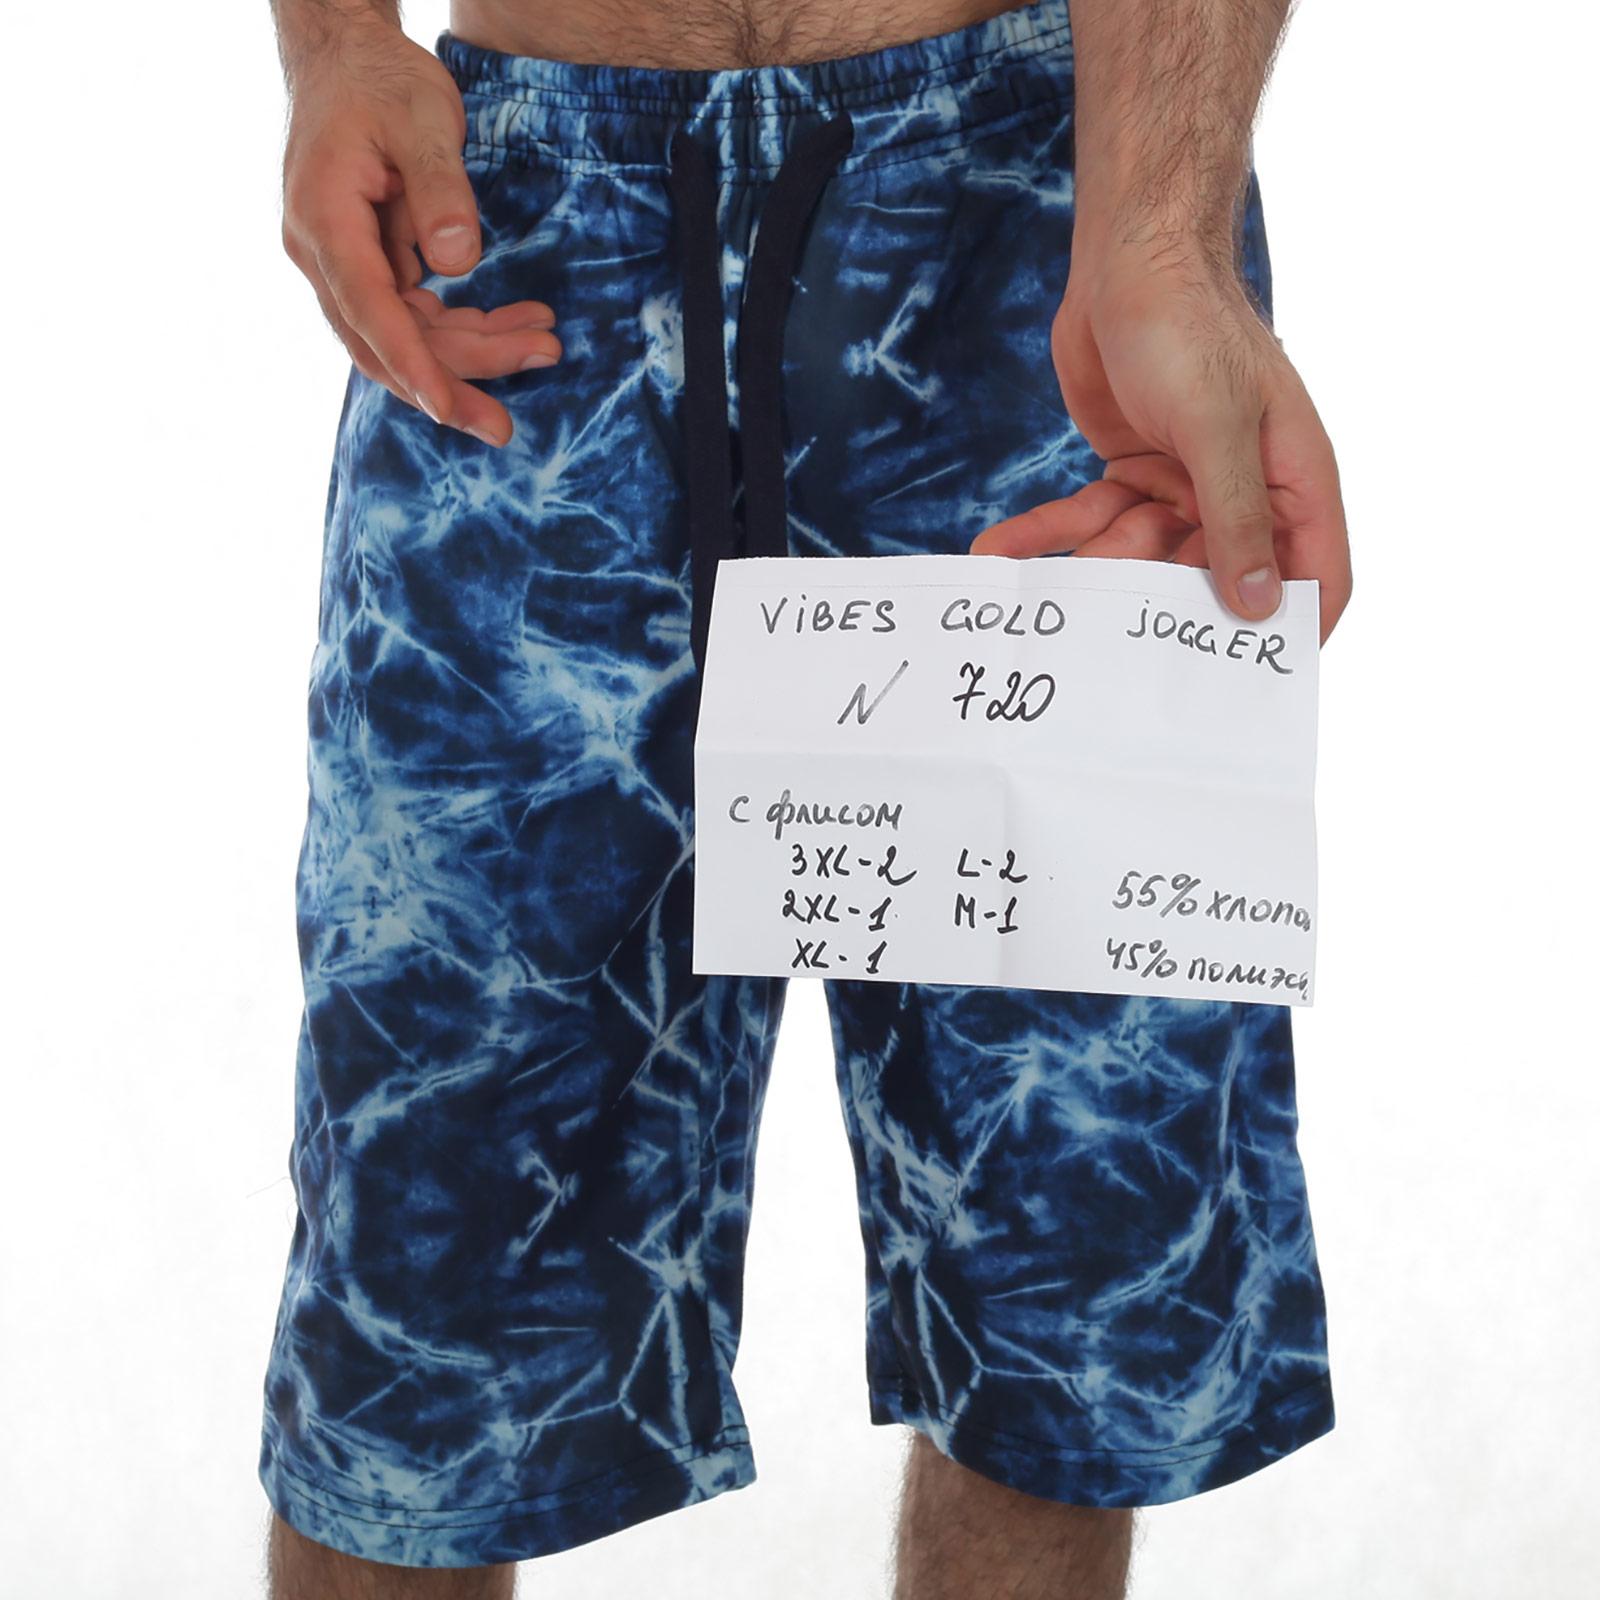 Фантастические мужские шорты-флис от ТМ Vibes Gold Jogger